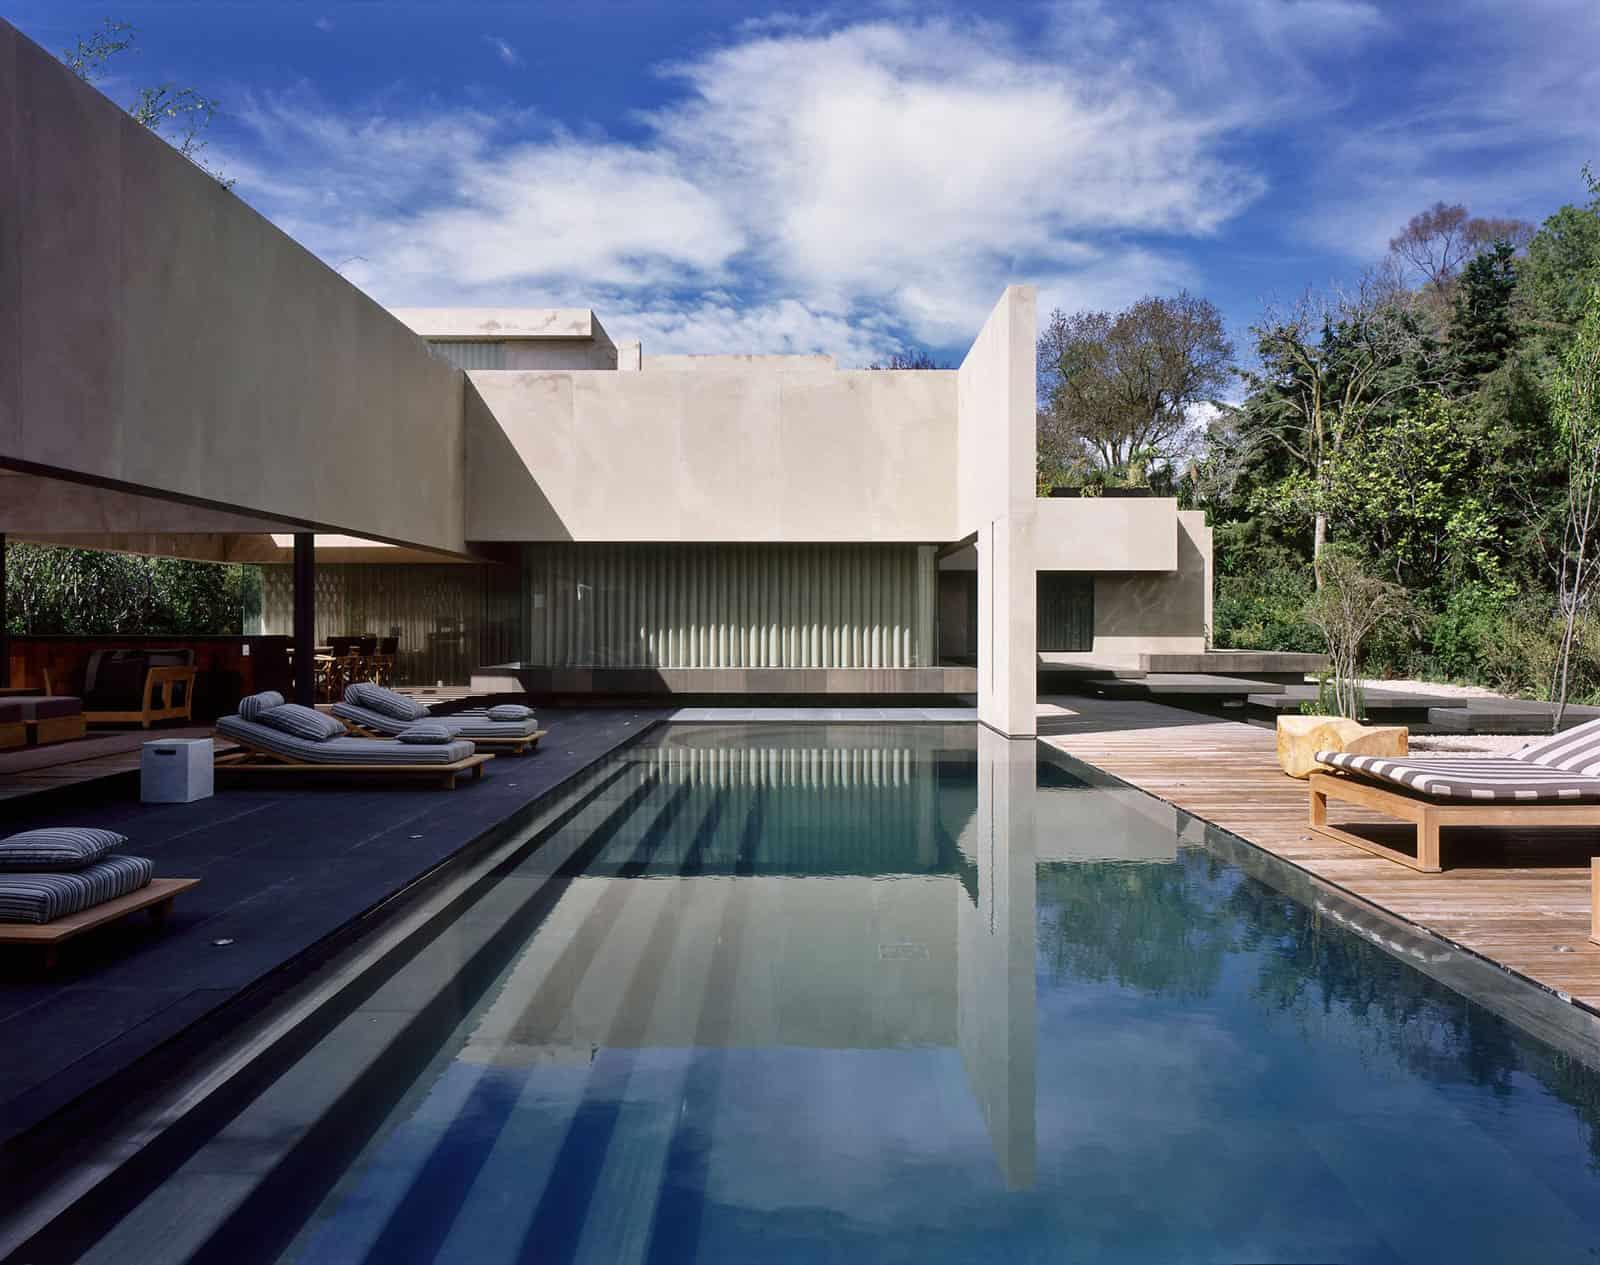 Central de arquitectura a mexico city based design studio has - Casa Reforma By Central De Arquitectura